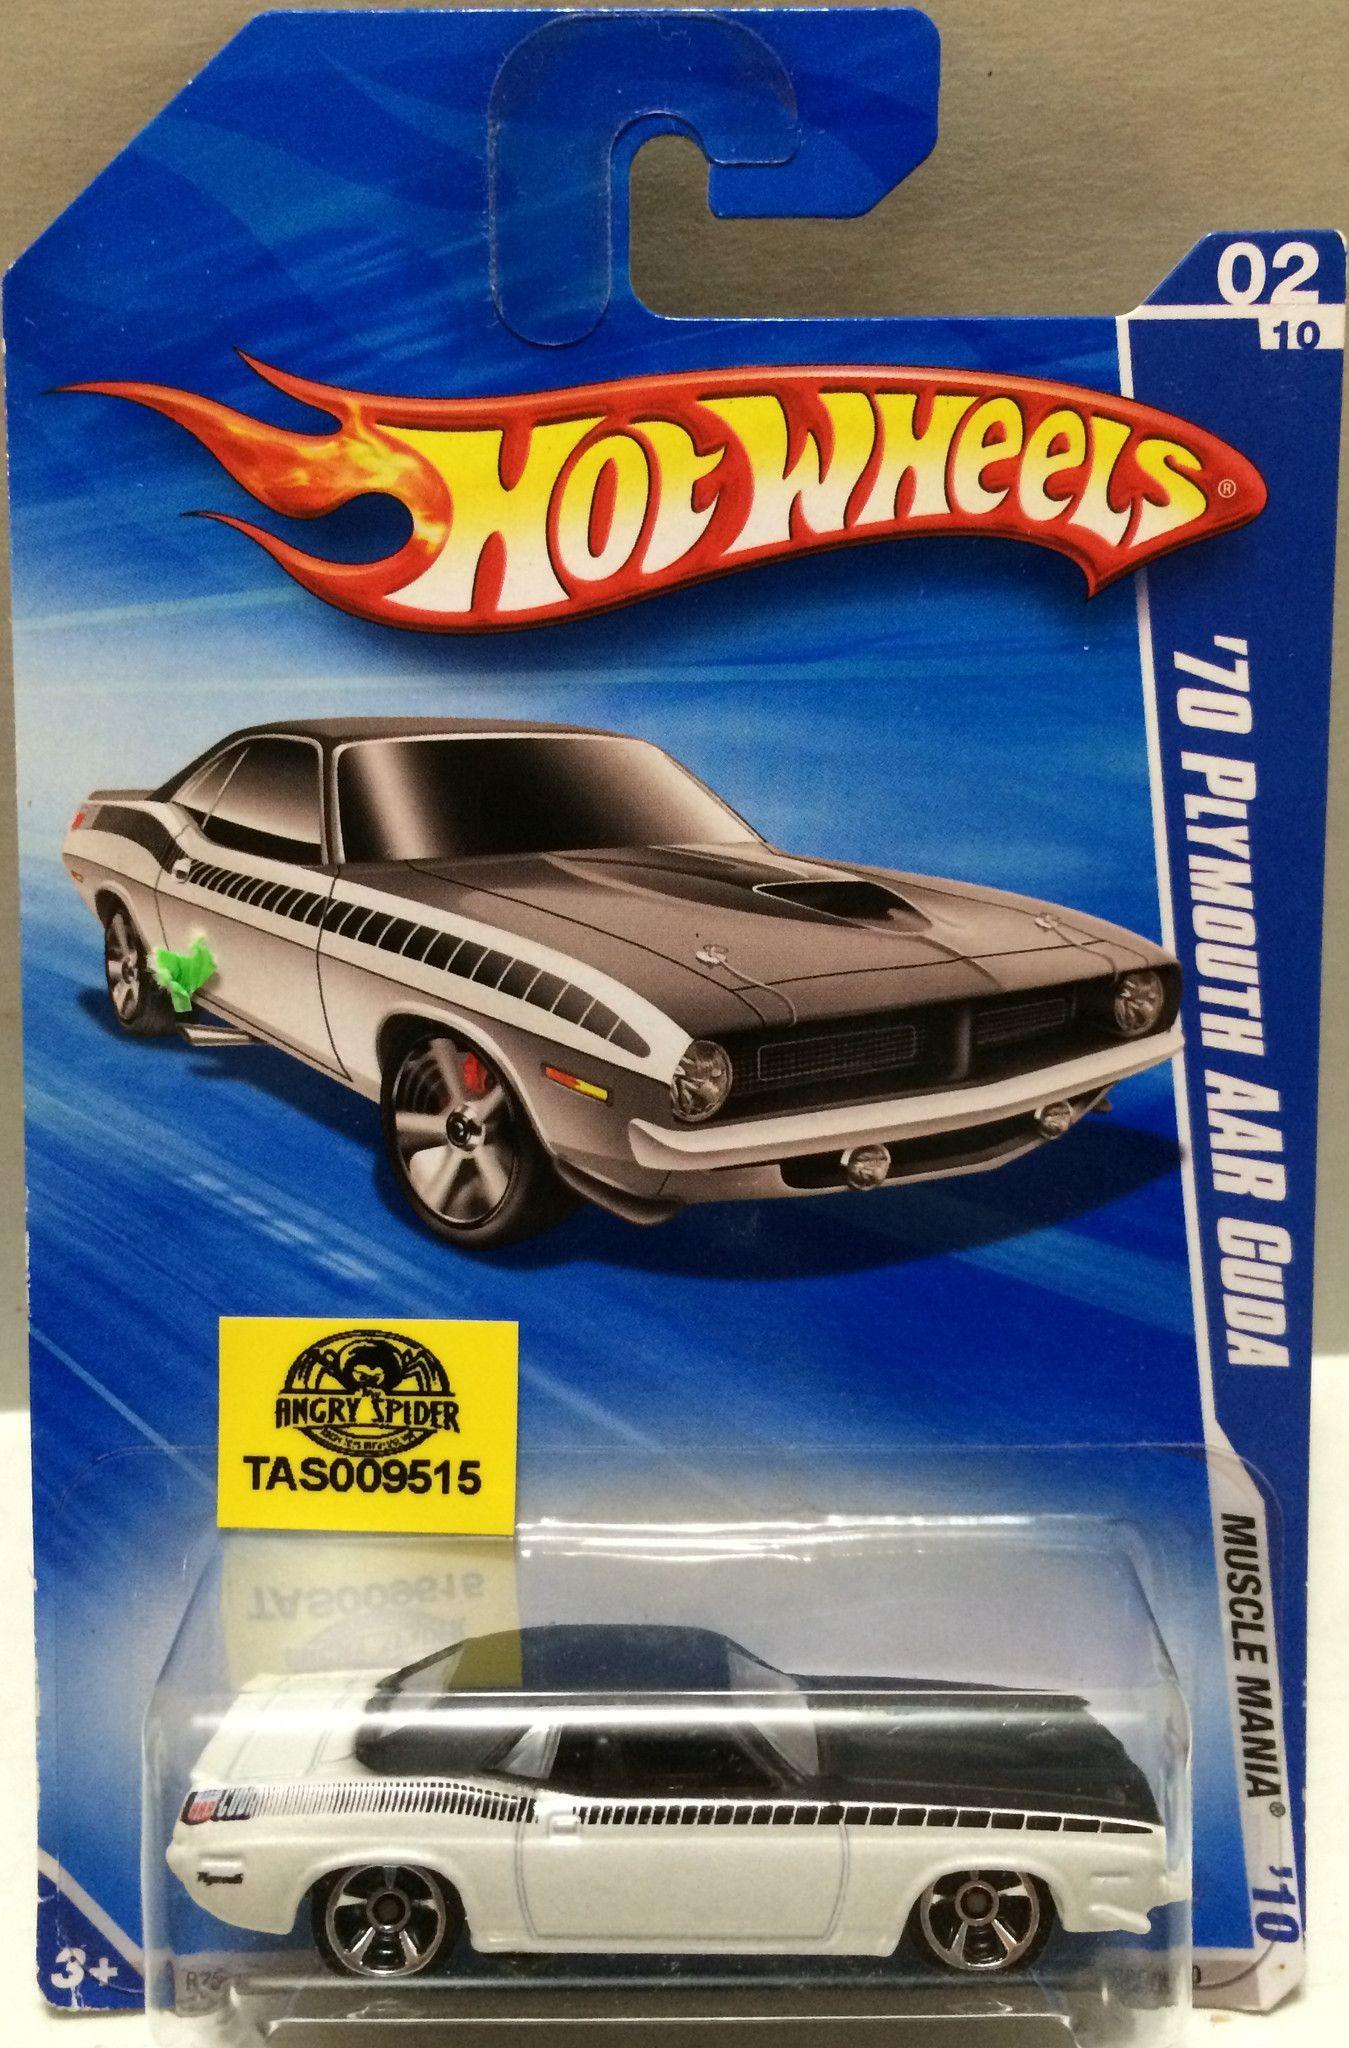 Mattel legends 1 24 1969 hot wheels twin mill concept car electronic -  Tas009515 Mattel Hot Wheels Racing Stock Car 70 Plymouth Aar Guda